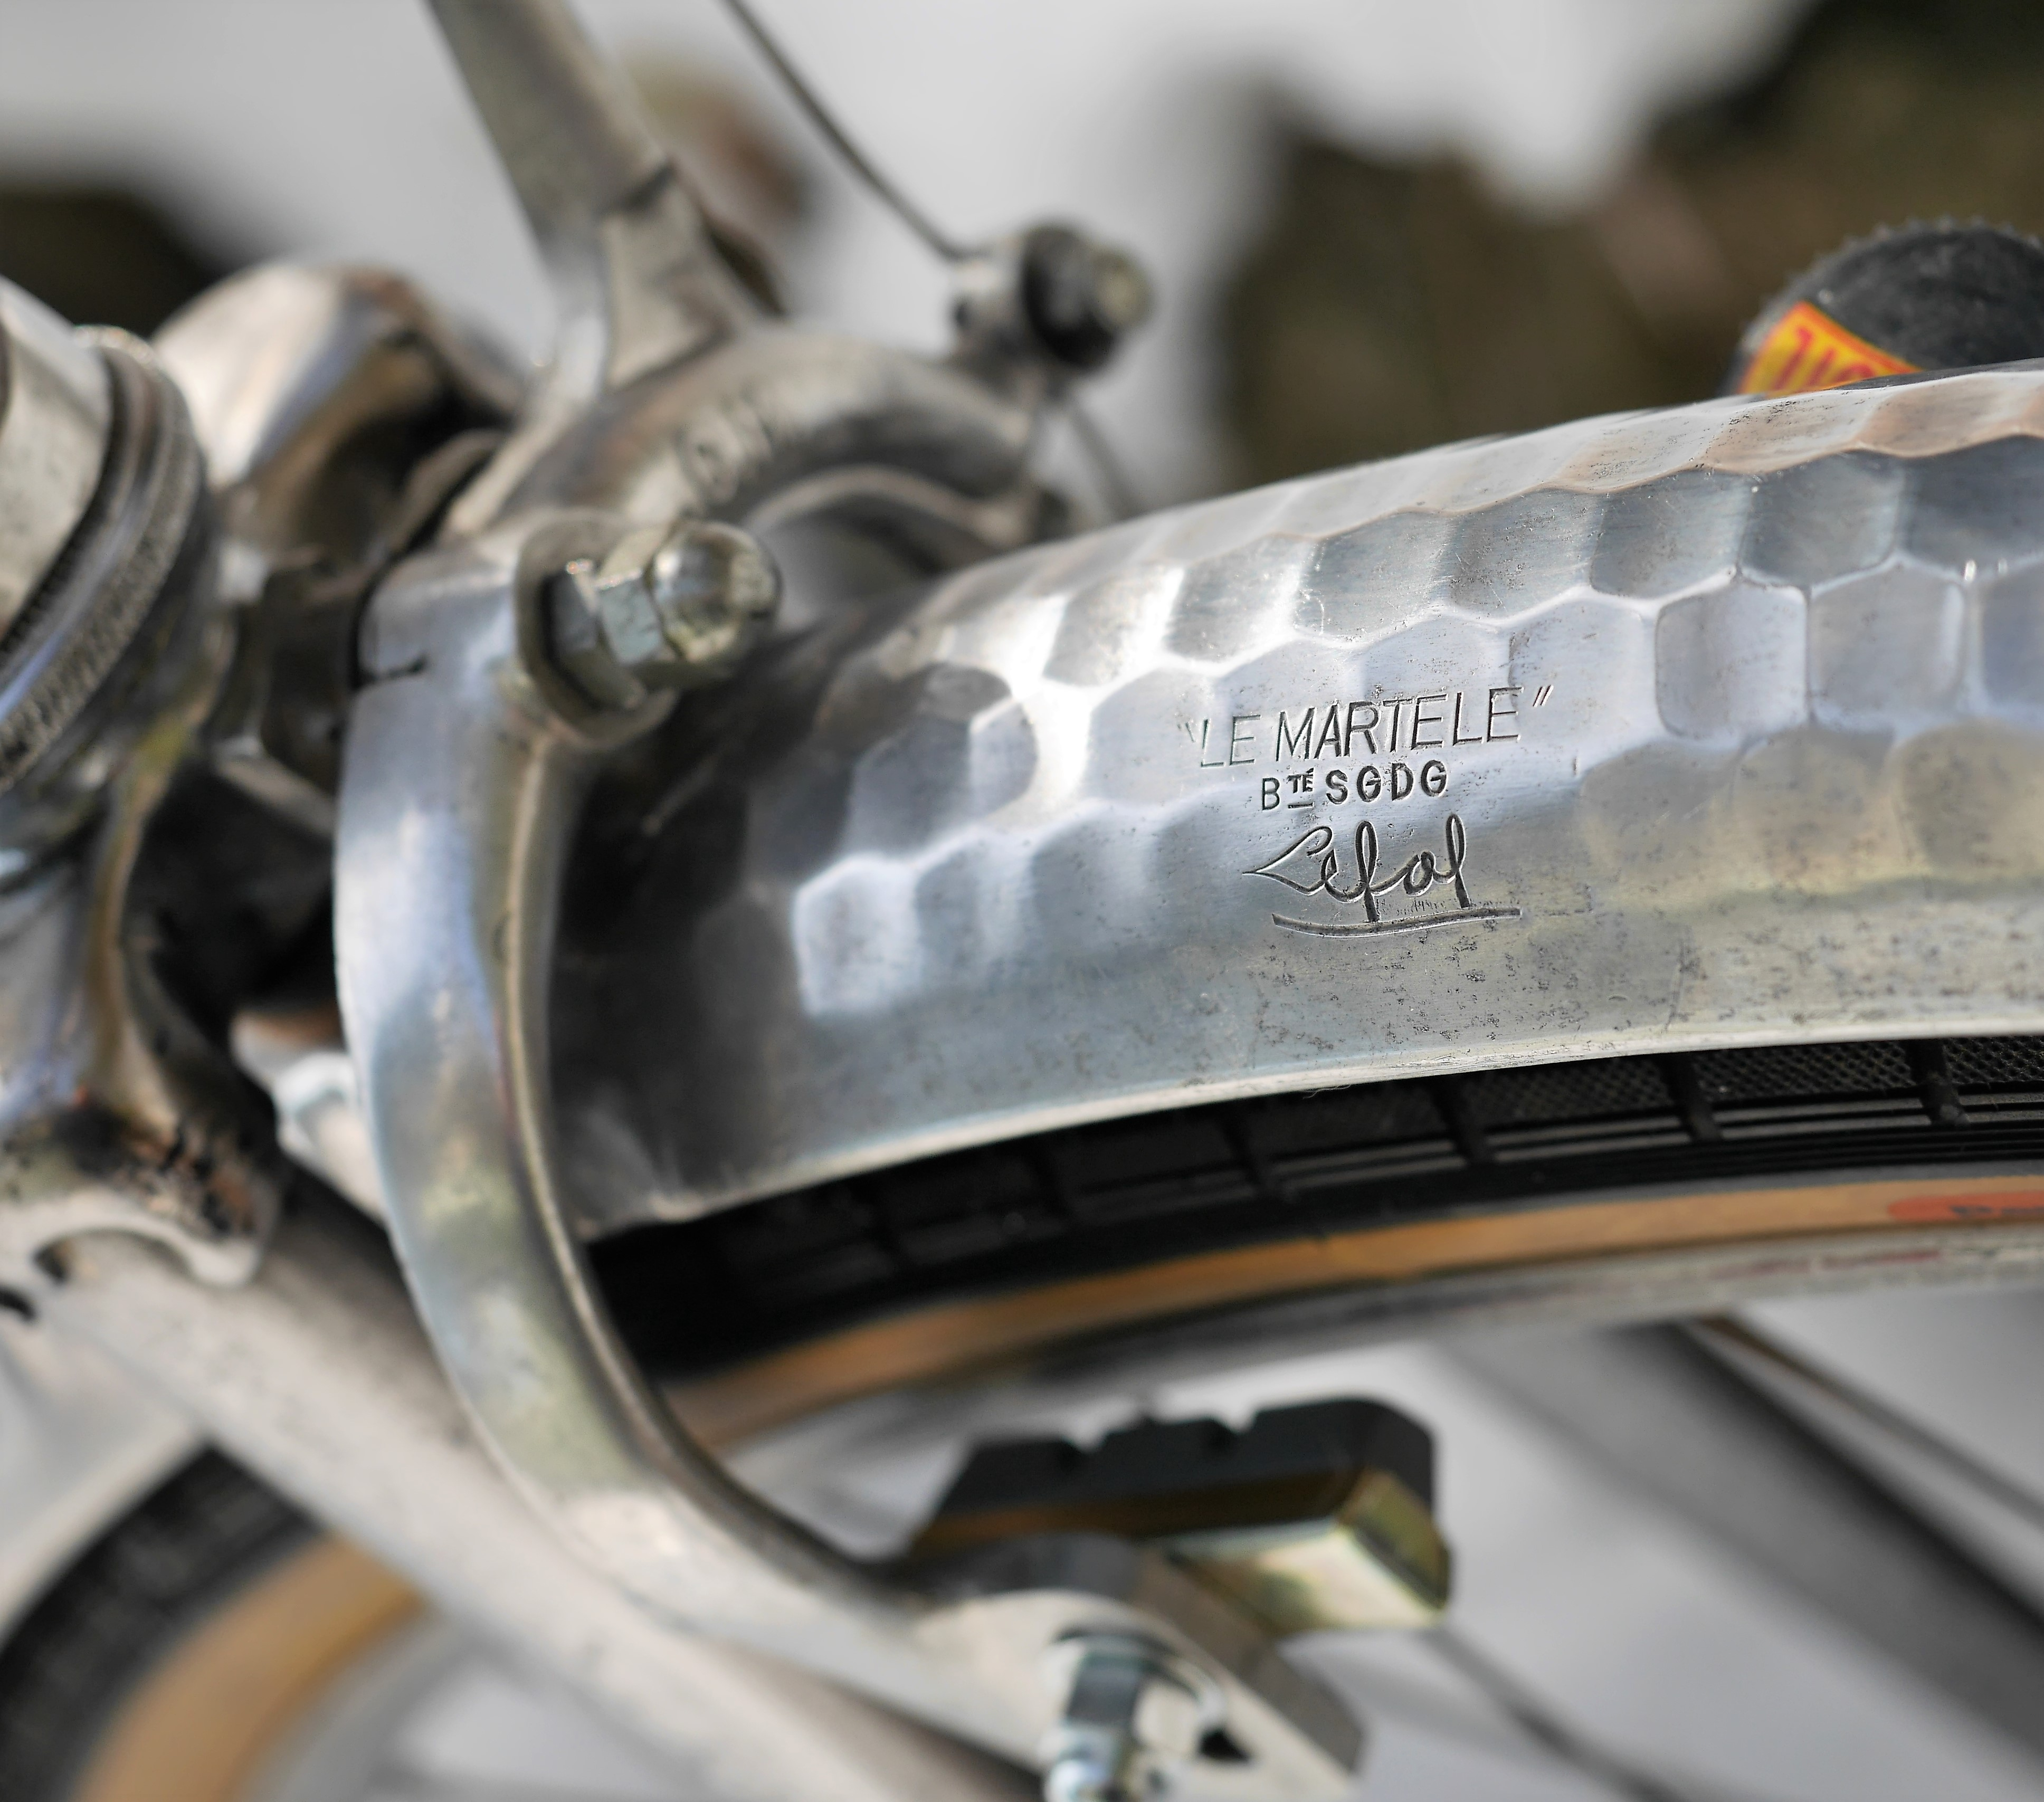 VINTAGE BIKE BICYCLE ALLOY FENDER ALUMINIUM FENDER RANDONNEUR BIKE 650 650B NOS